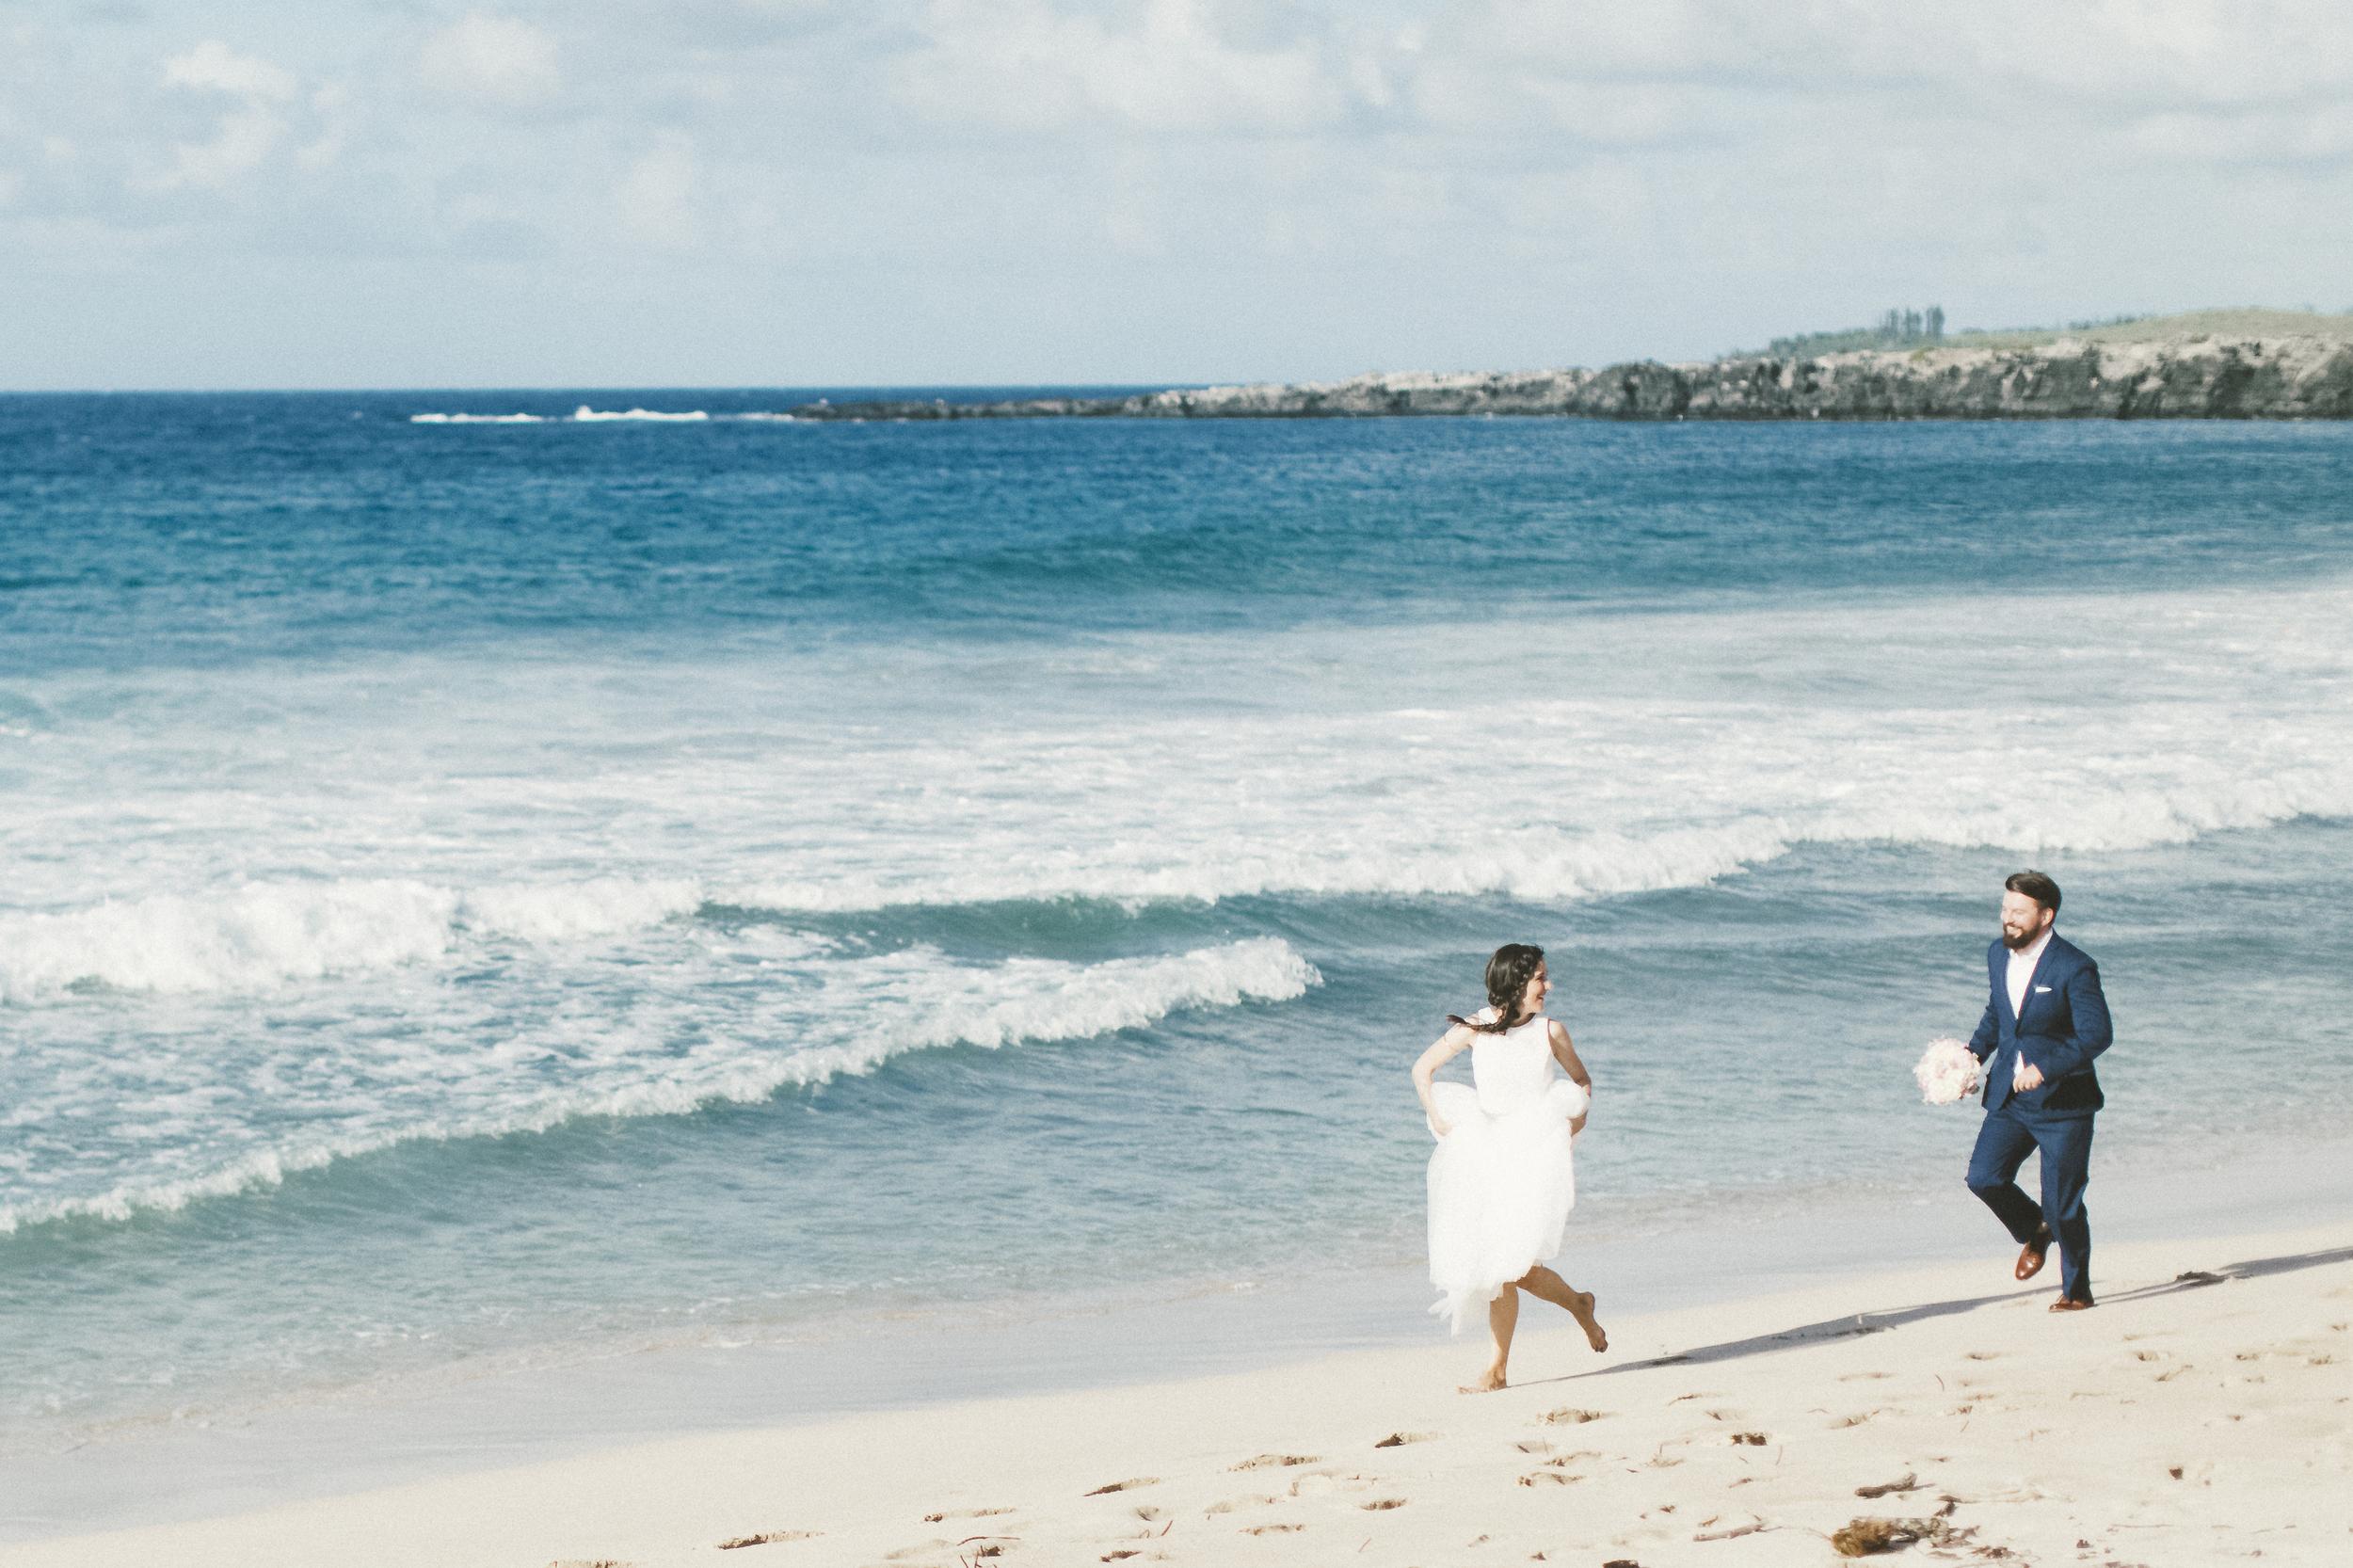 angie-diaz-photography-maui-wedding-ironwoods-beach-30.jpg